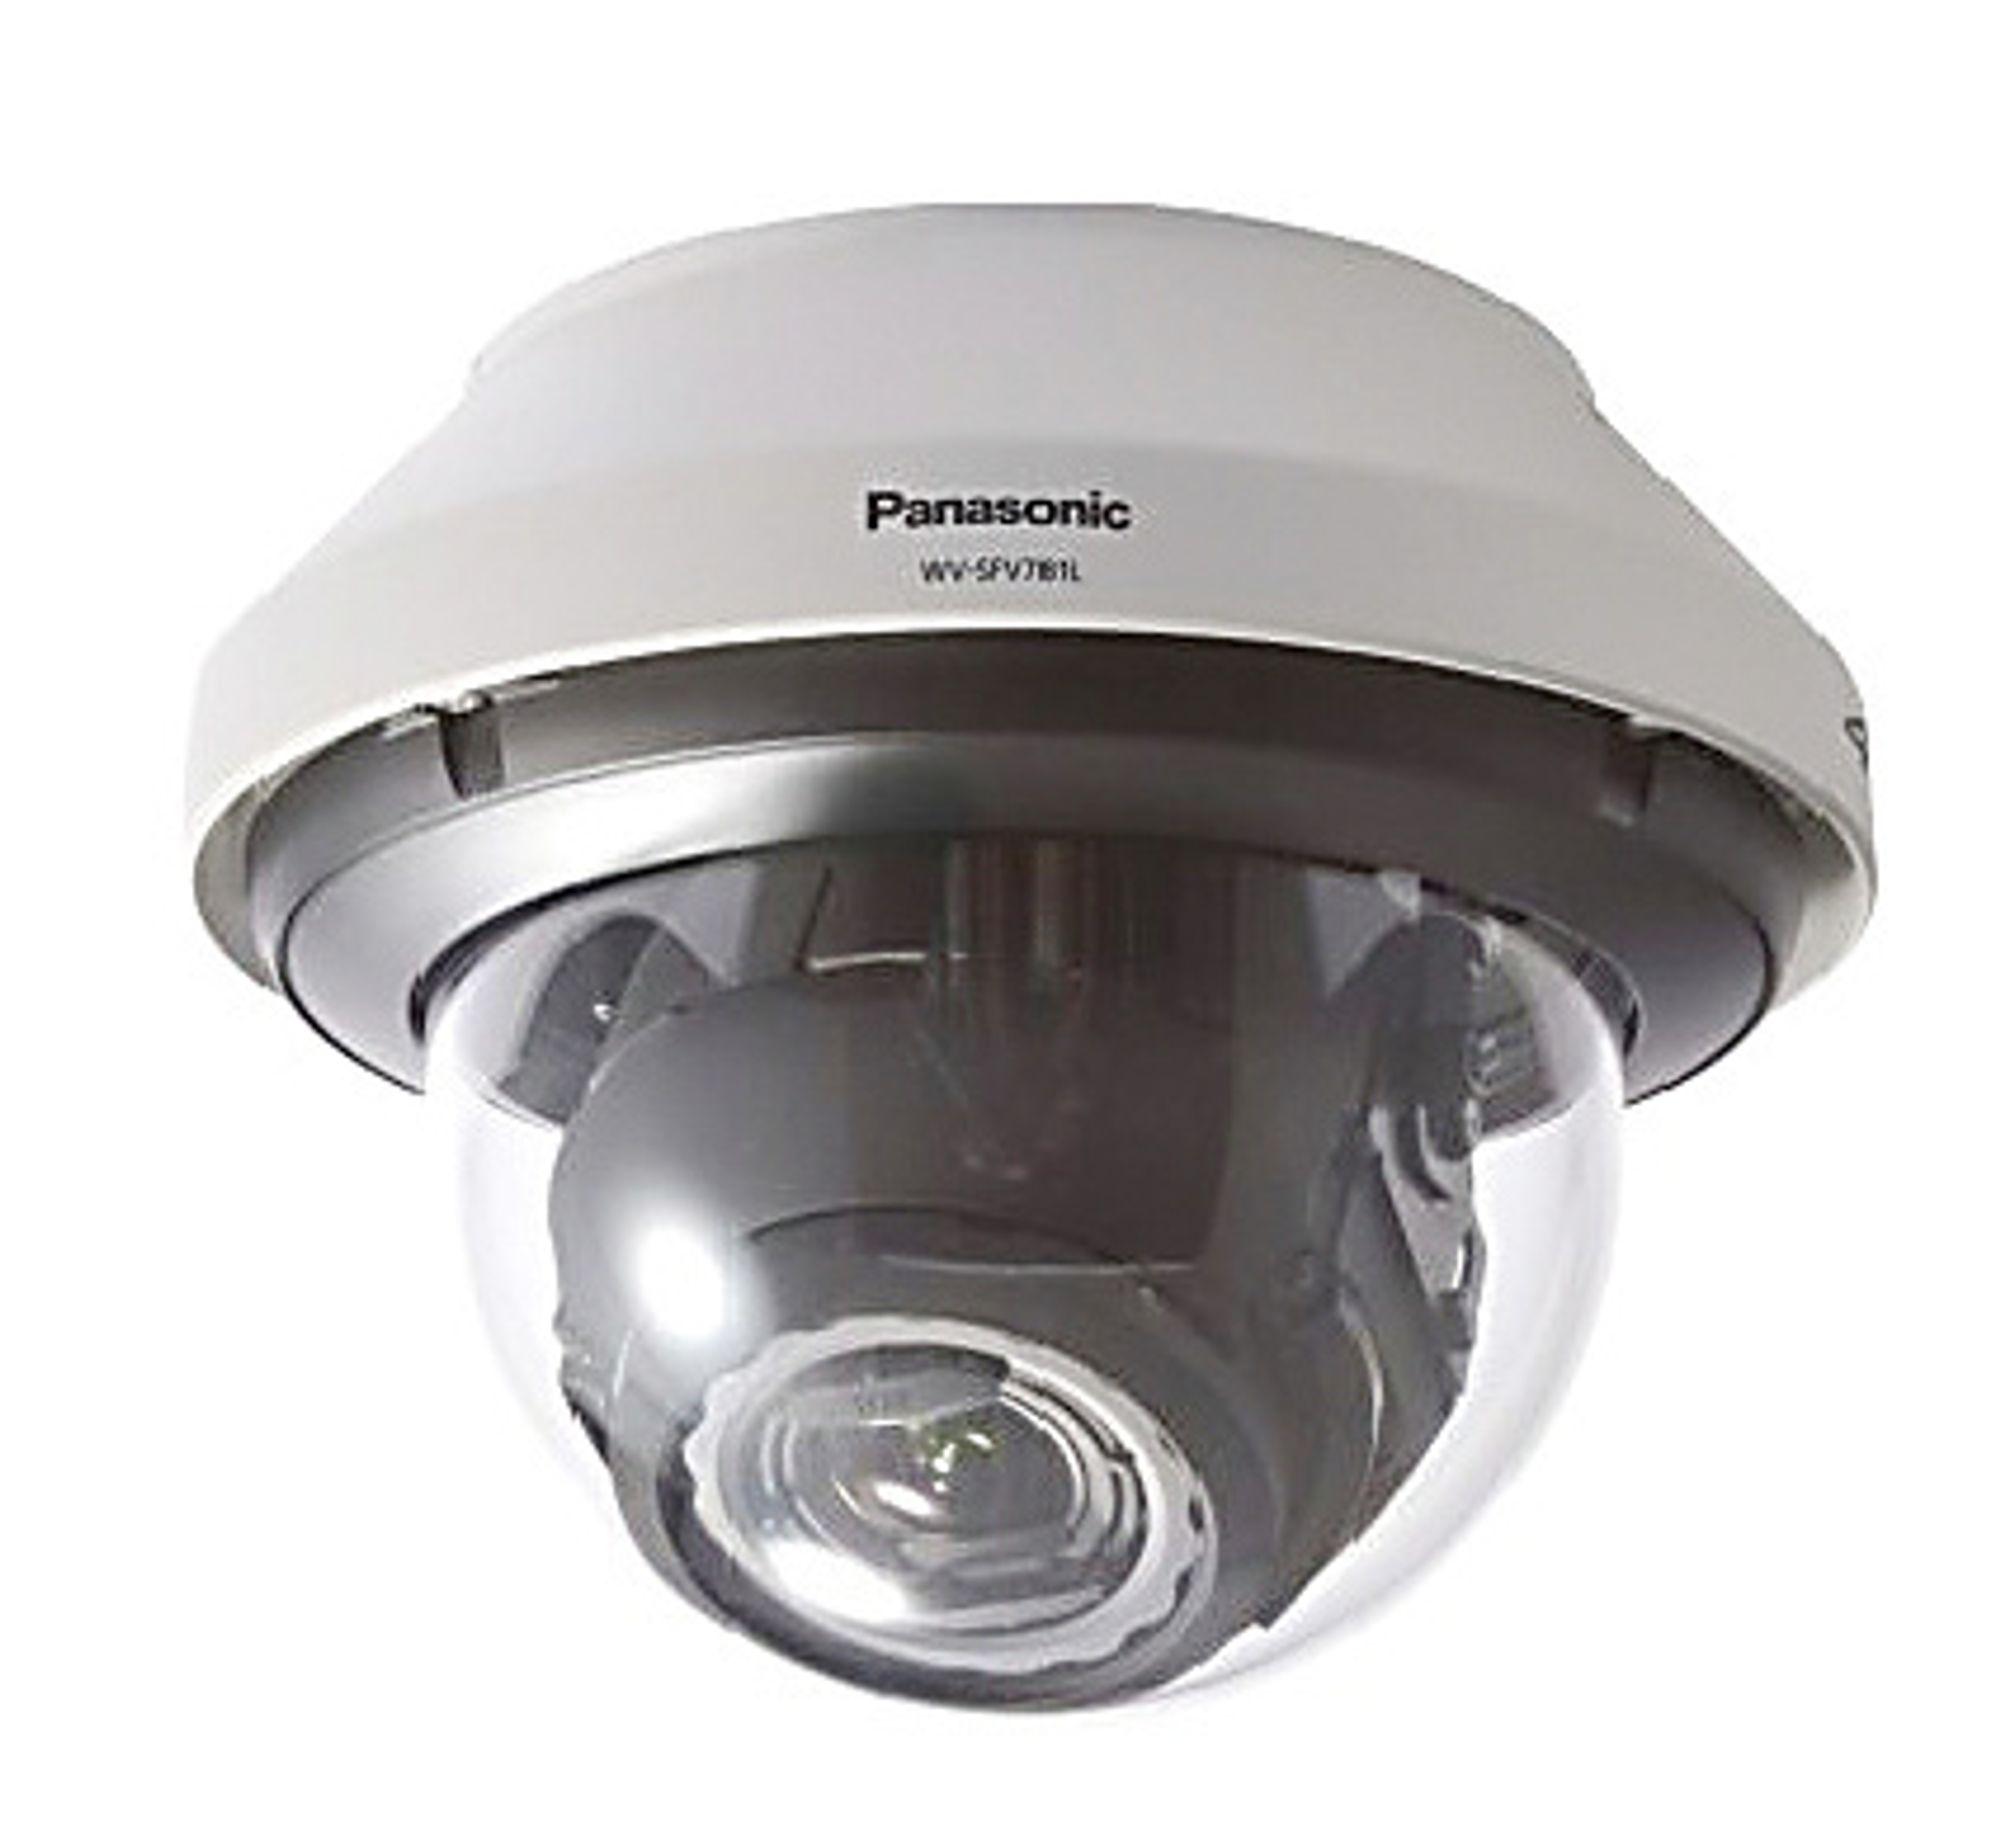 WV-SFV781L overvåkingskamera fra Panasonic.